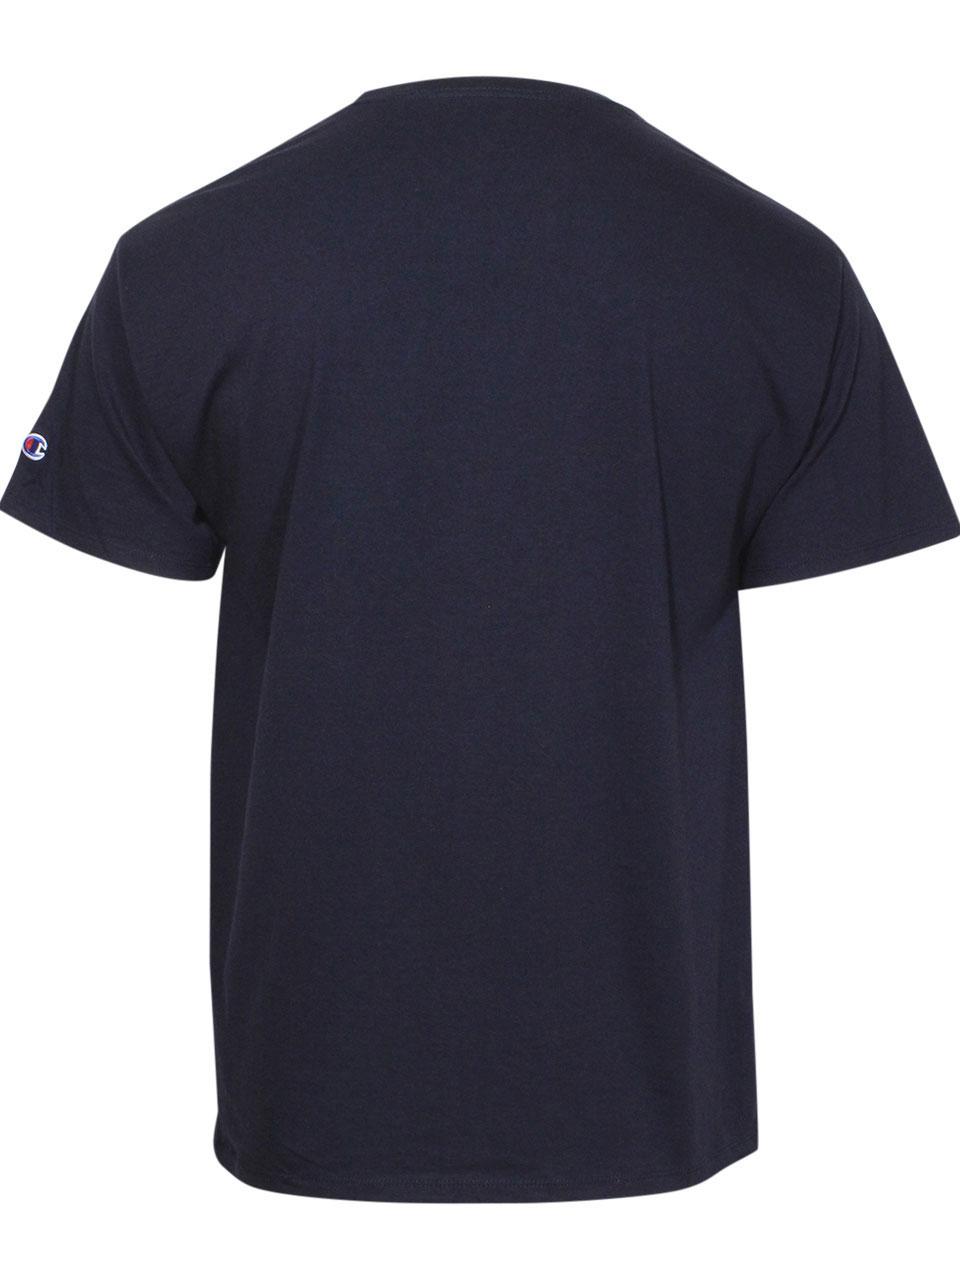 Champion-Split-Script-Logo-Jersey-T-Shirt-Men-039-s-Short-Sleeve-Crew-Neck-Cotton thumbnail 6